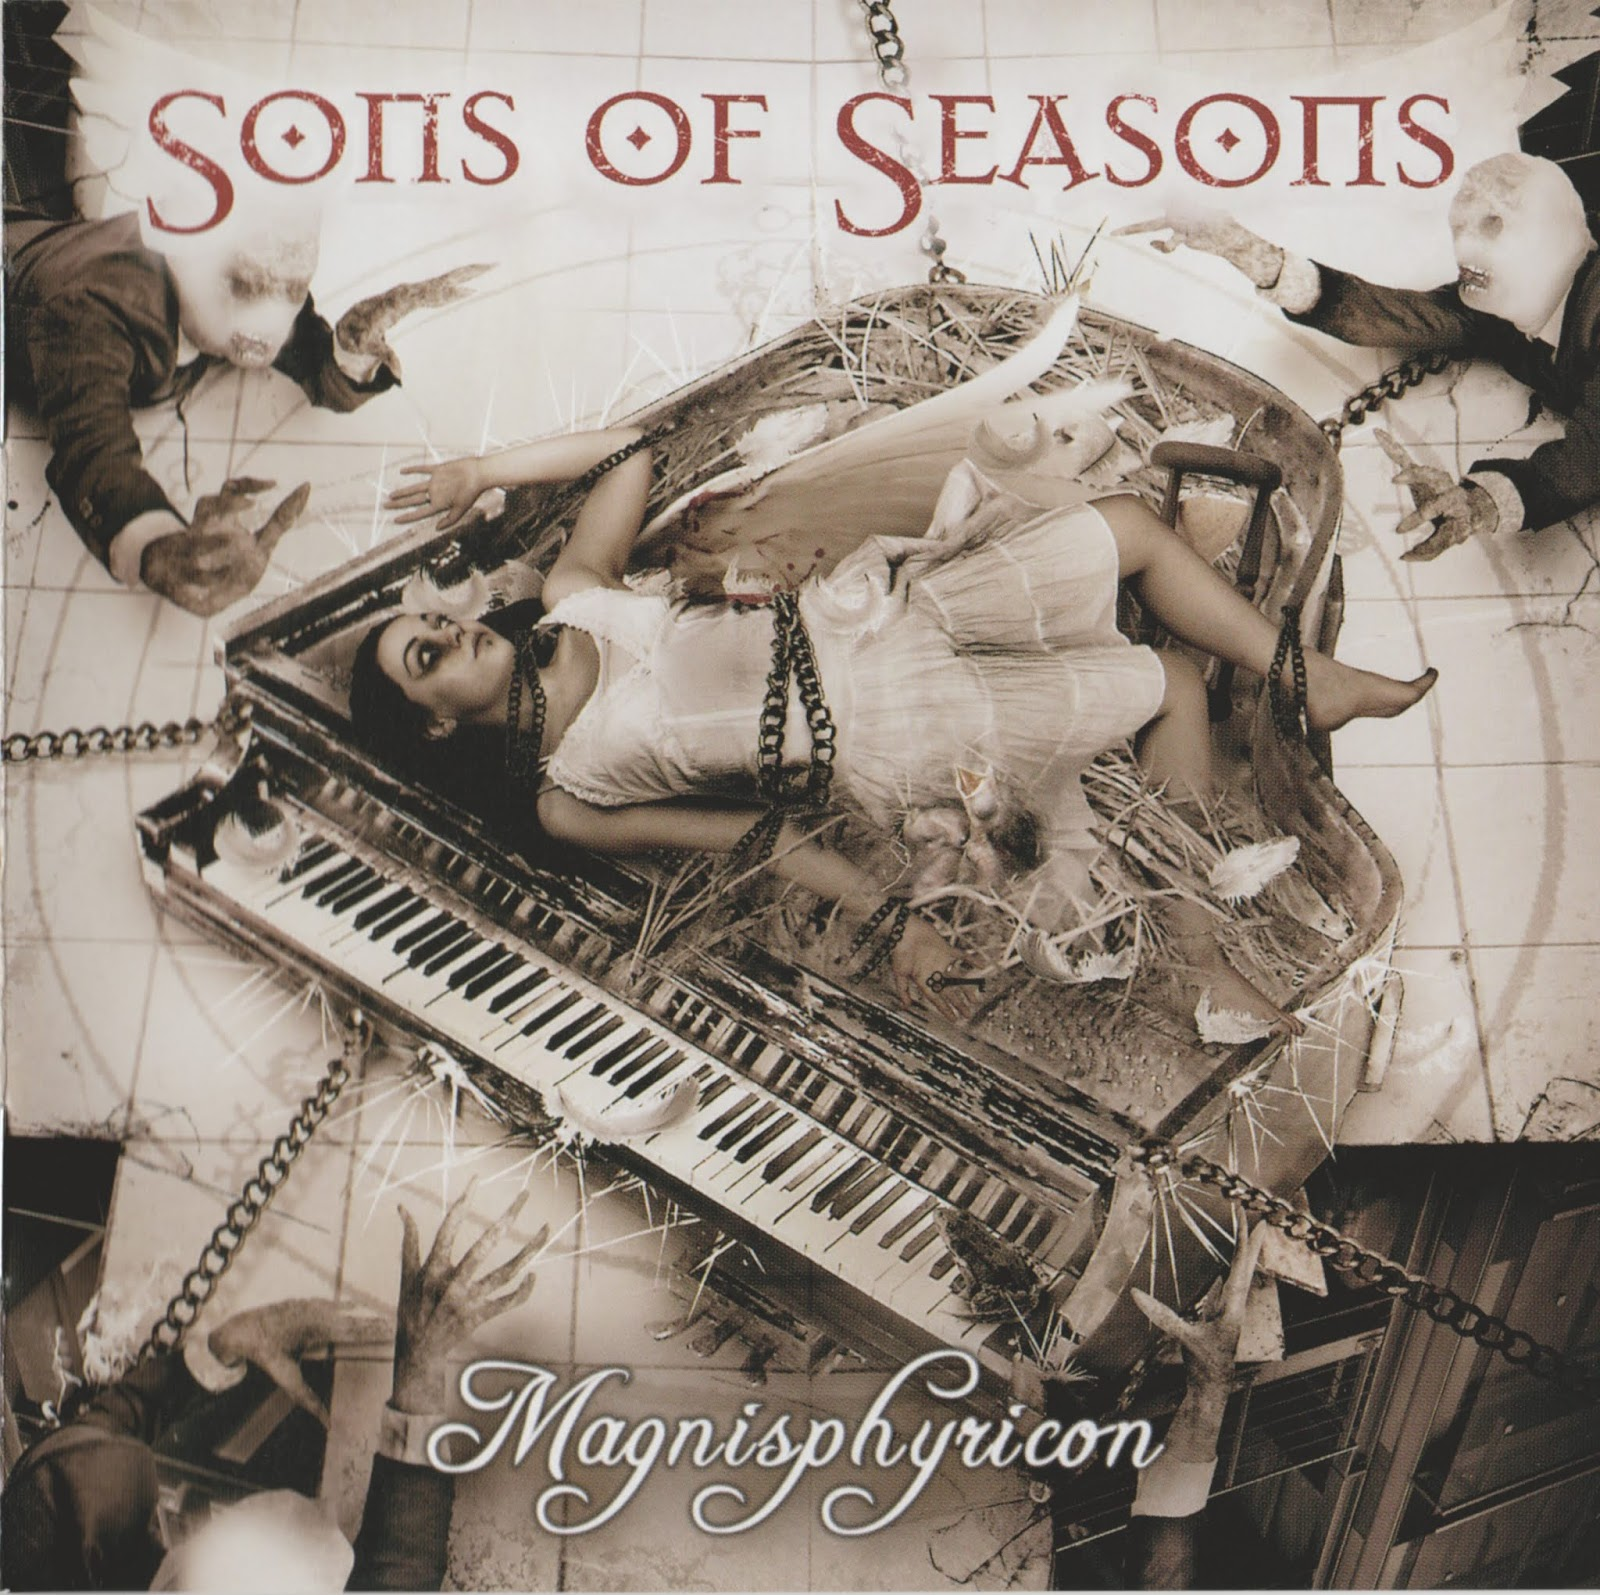 Sons of Seasons — Magnisphyricon (2011)